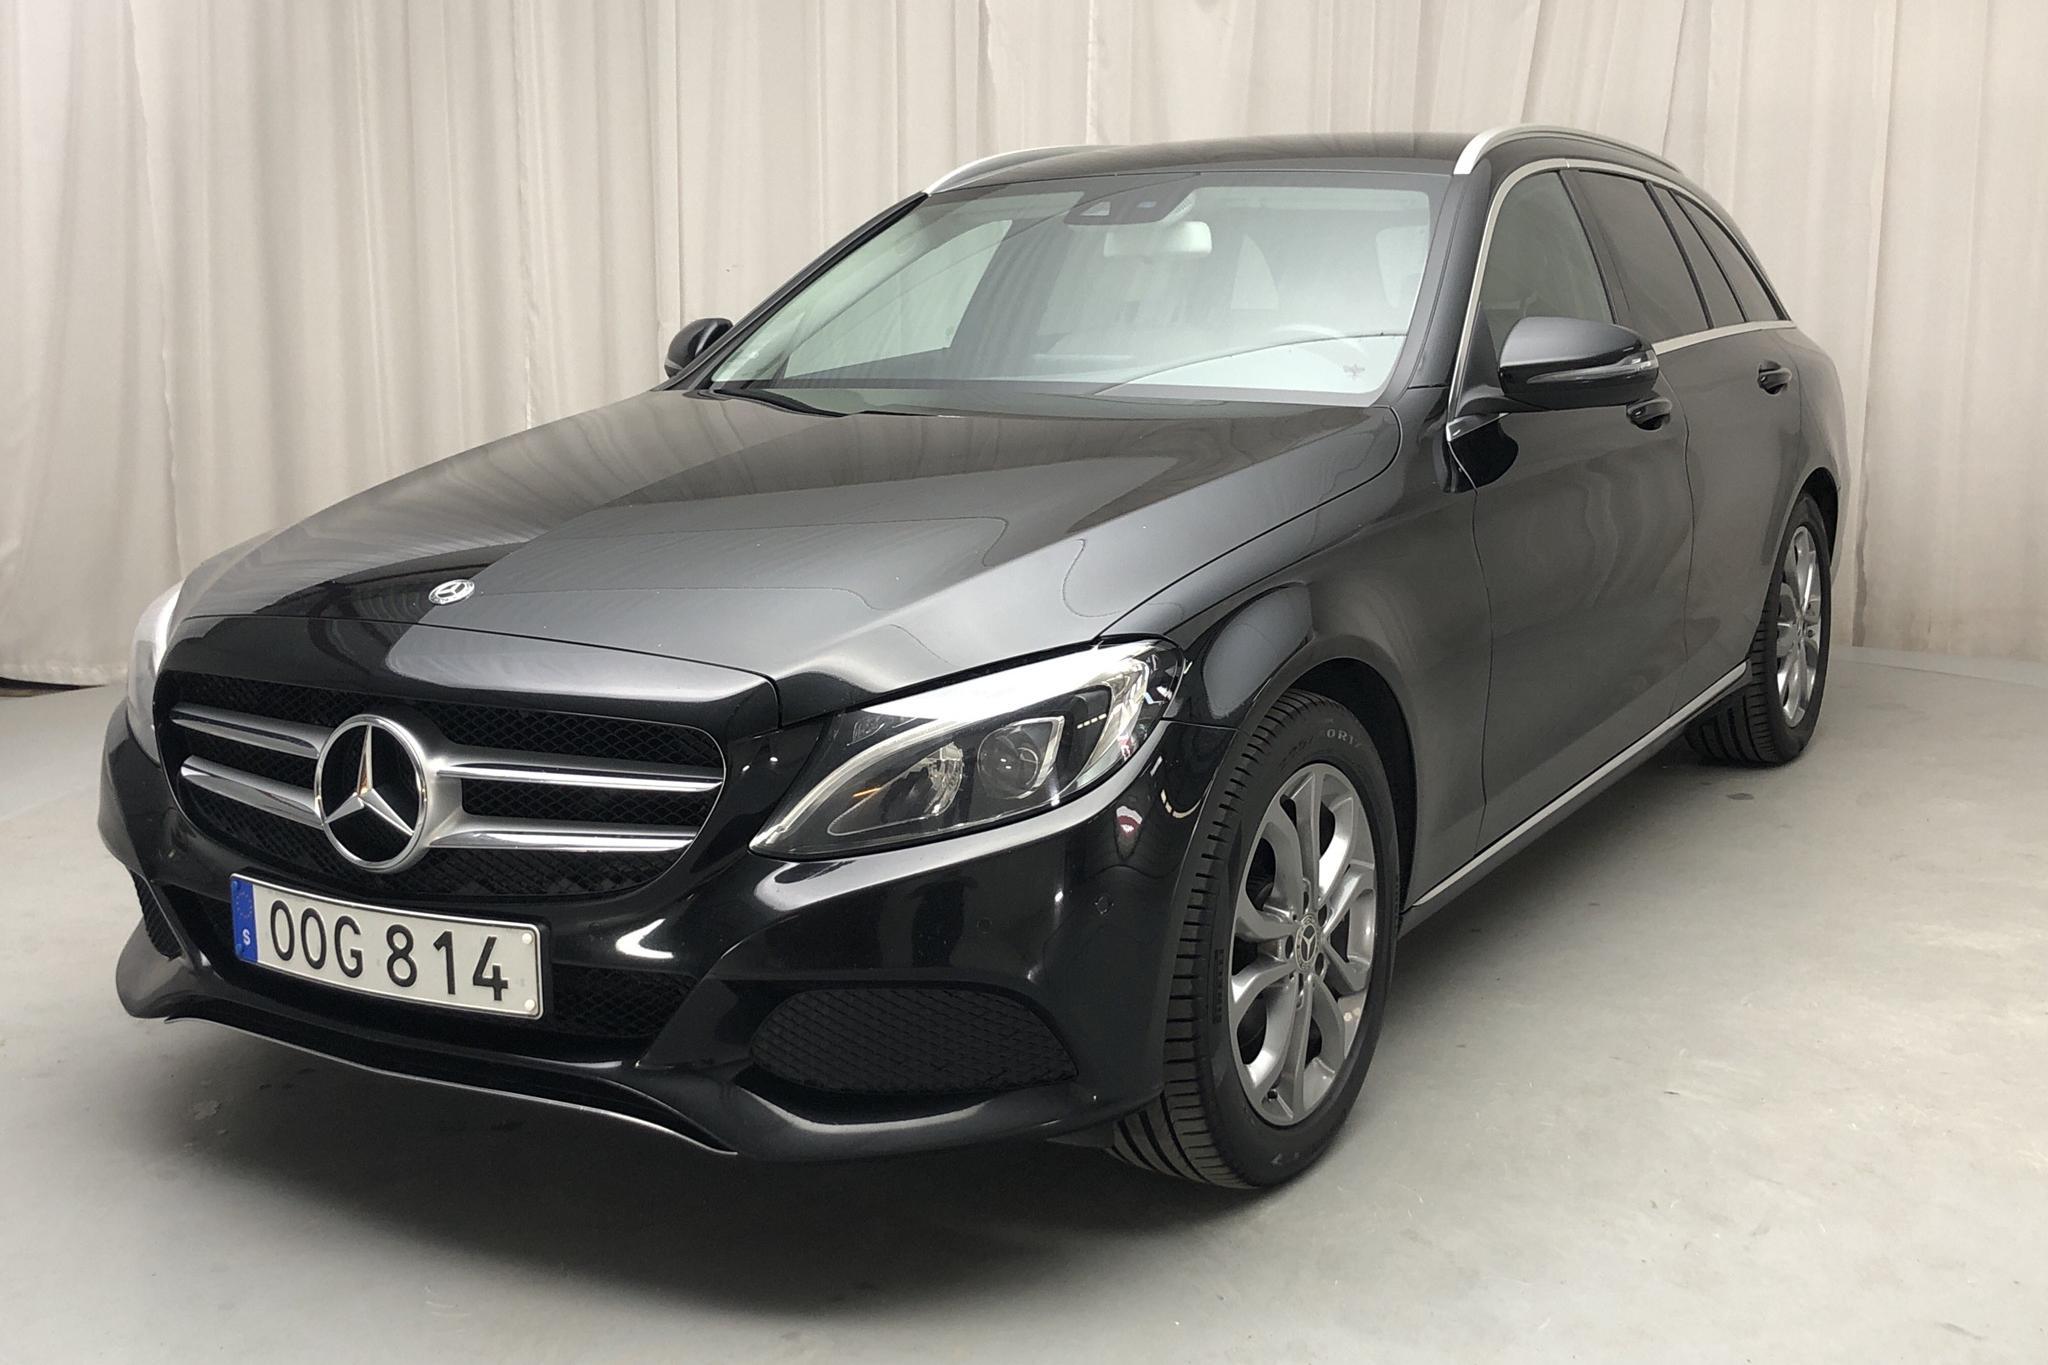 Mercedes C 220 d Kombi S205 (170hk) - 146 710 km - Automatic - black - 2017